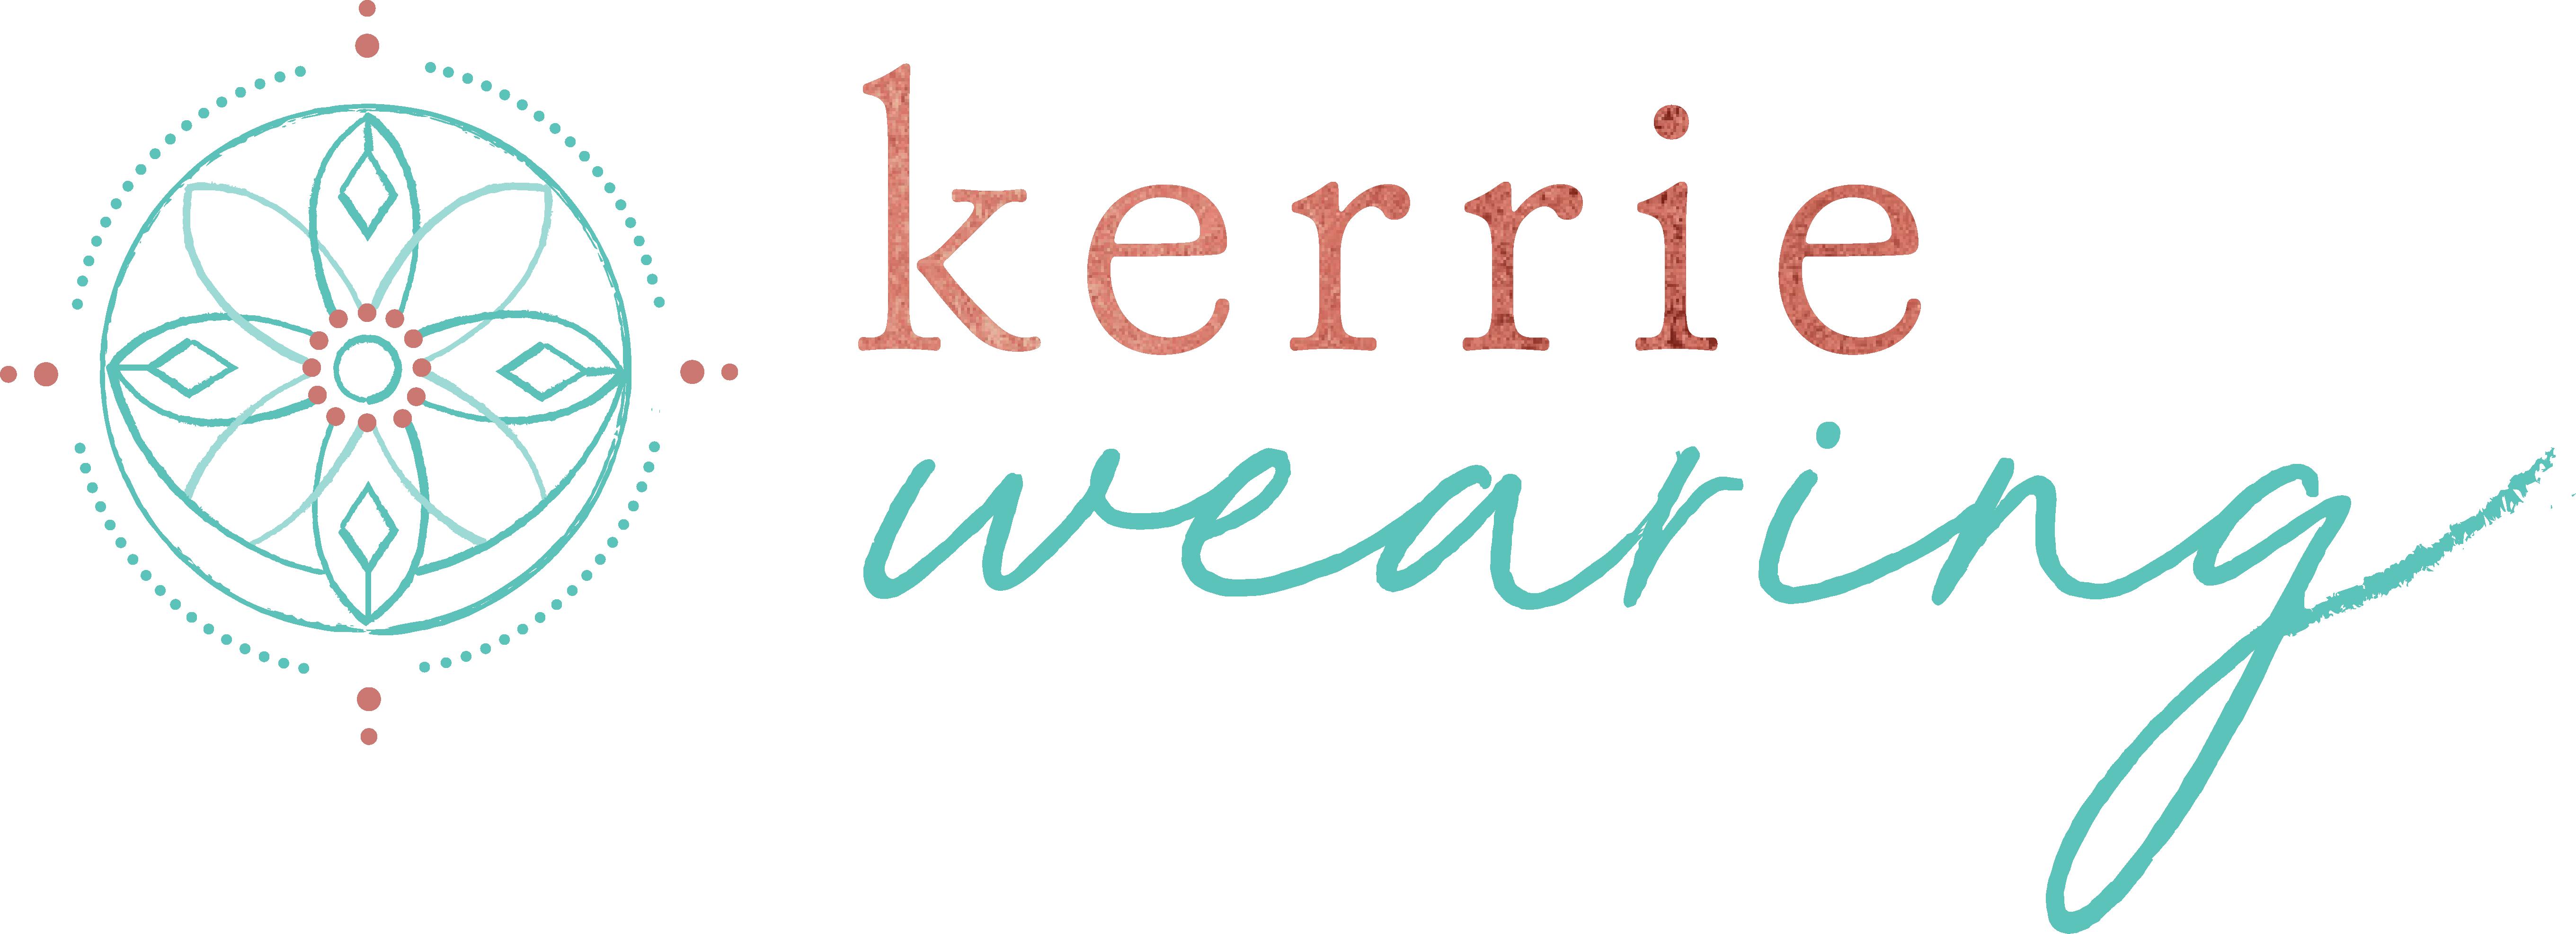 Kerrie Wearing